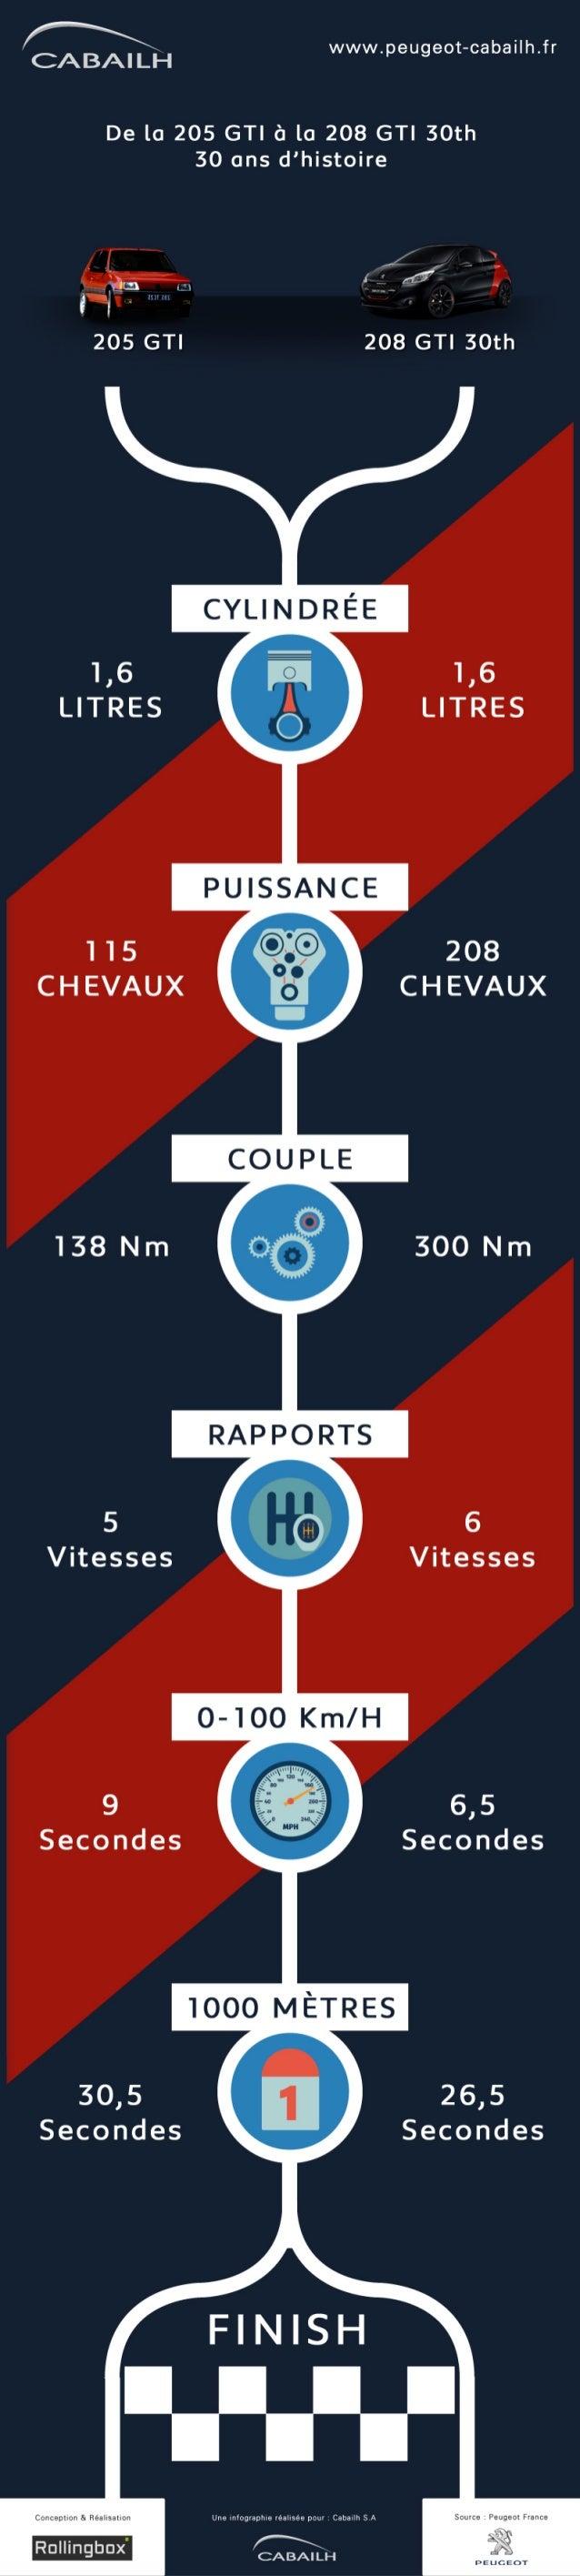 Infographie - Peugeot 205 GTI vs 208 GTI 30th